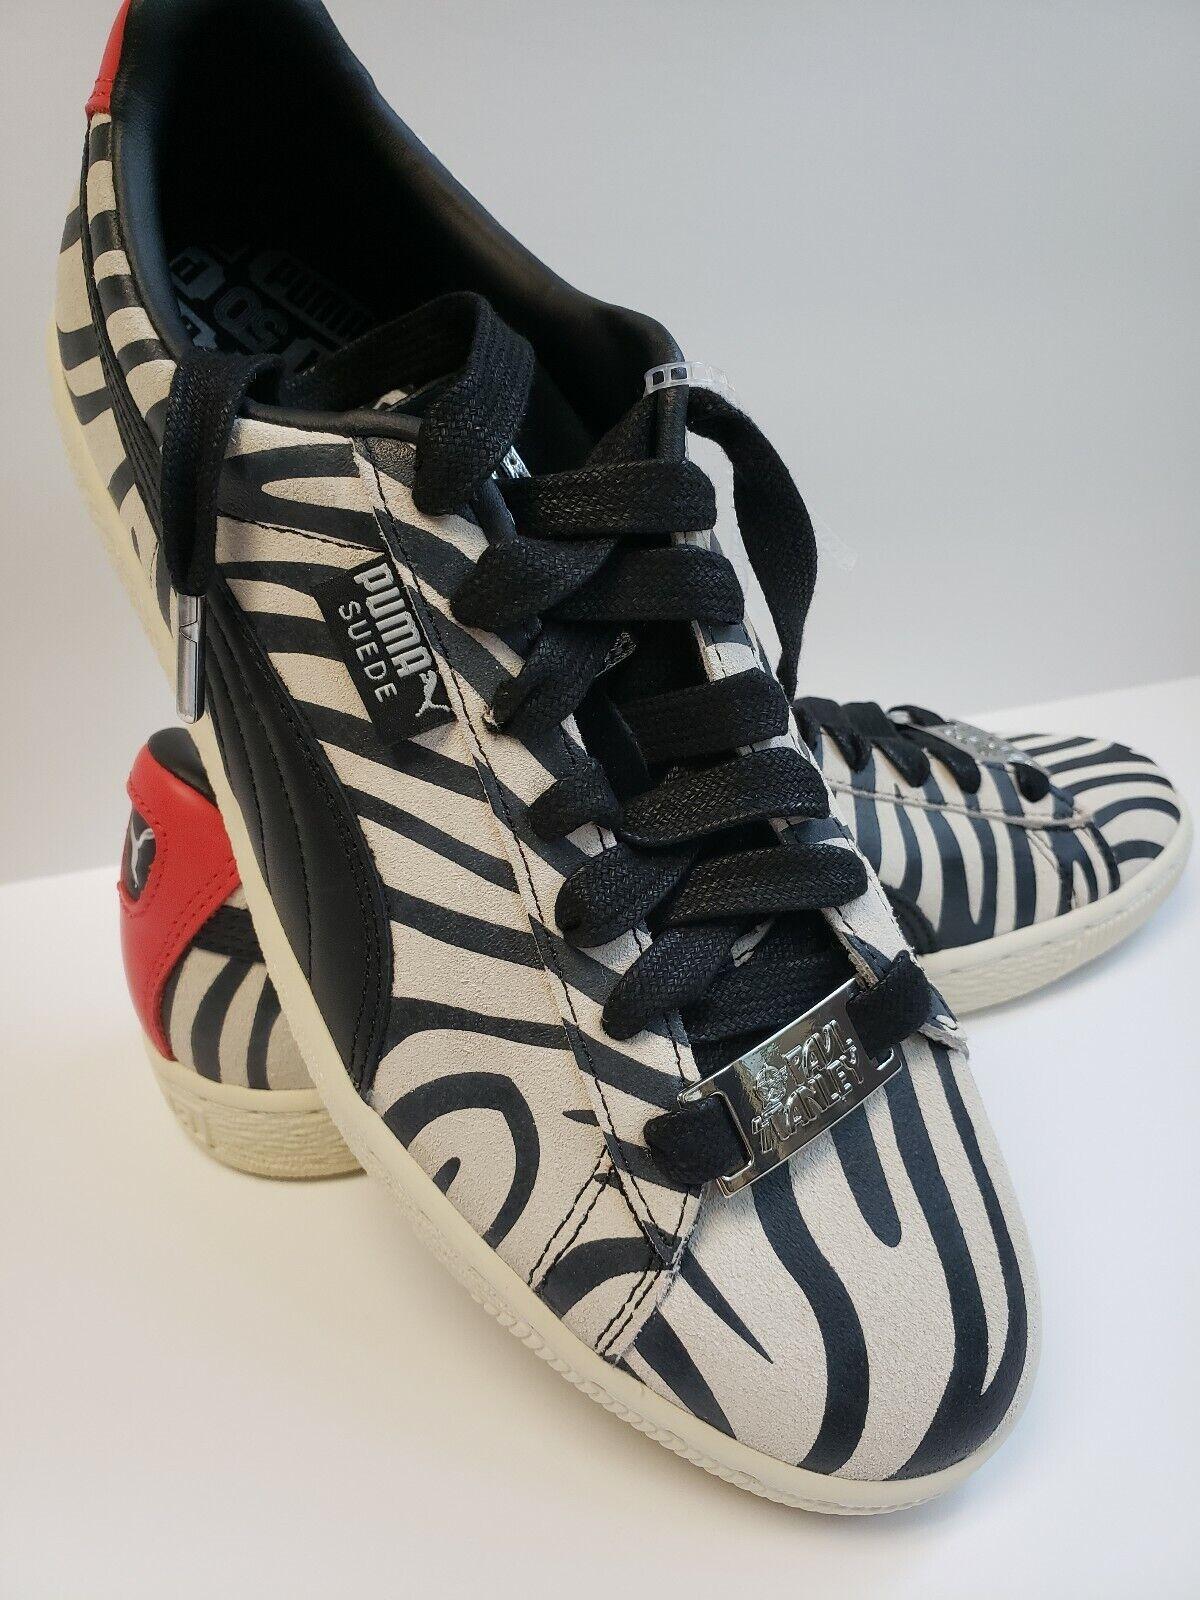 36c32af59ae Puma Suede KISS KISS KISS Collaboration Zebra Sneakers Men Size 8.5 ...